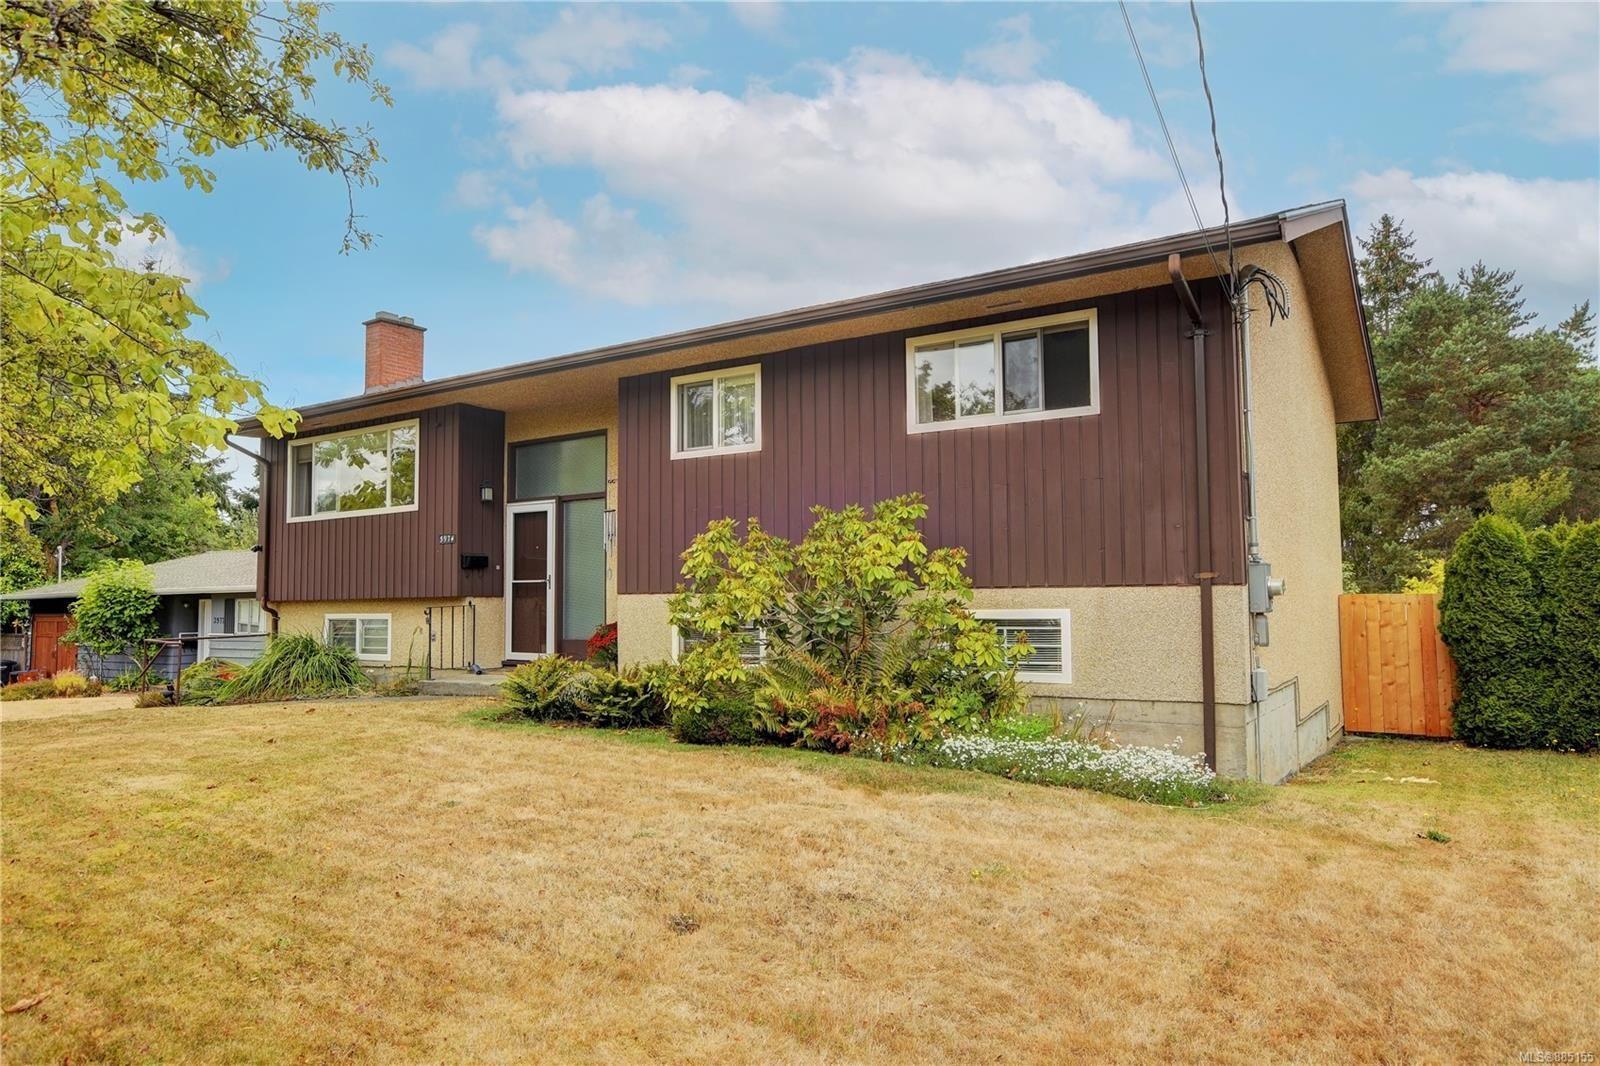 Main Photo: 3974 Maria Rd in : SE Gordon Head House for sale (Saanich East)  : MLS®# 885155